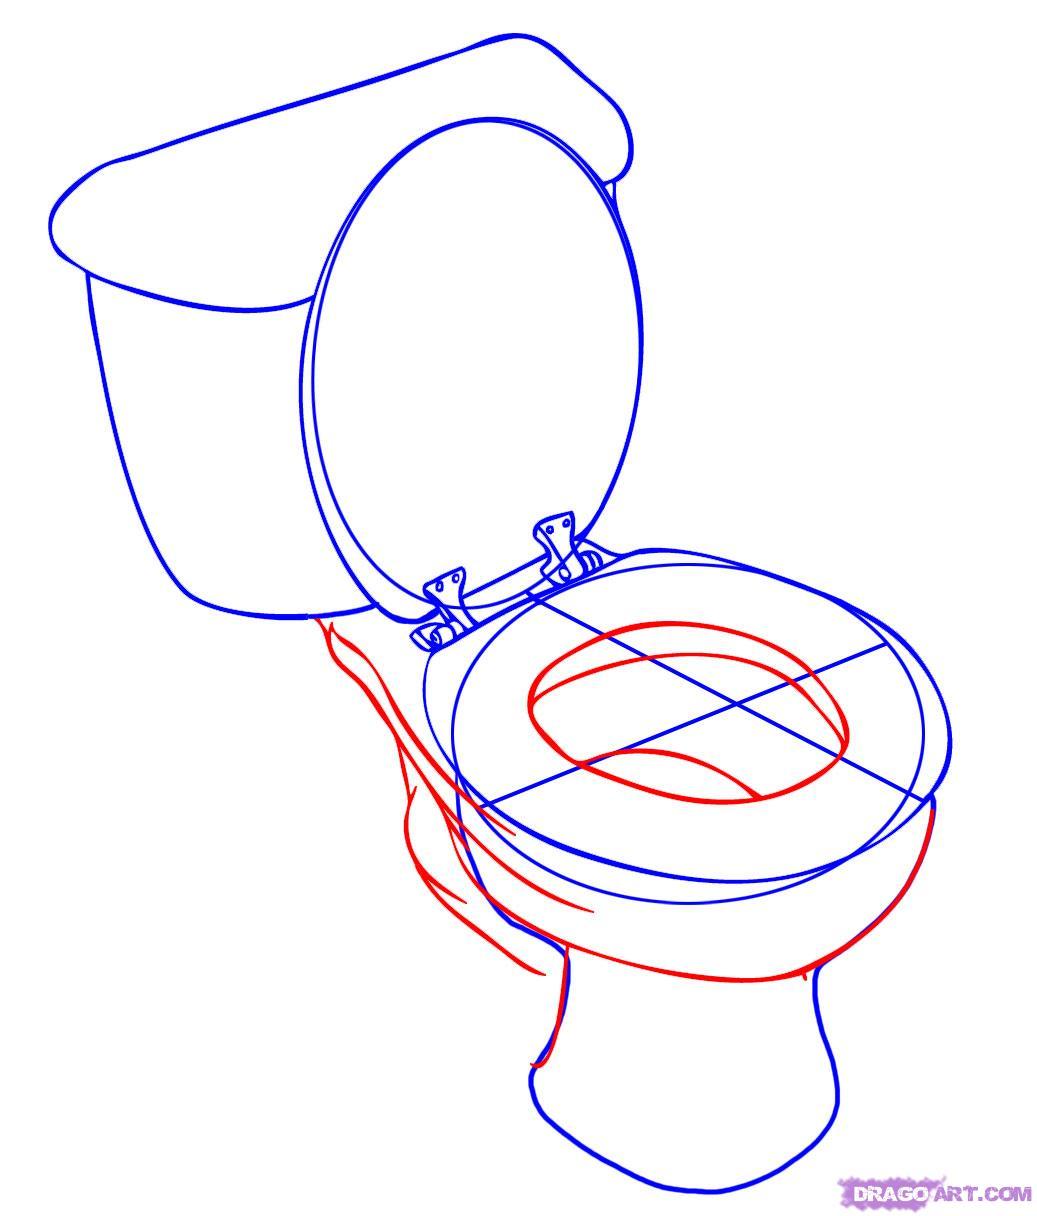 Drawn toilet Draw Culture Pop draw a